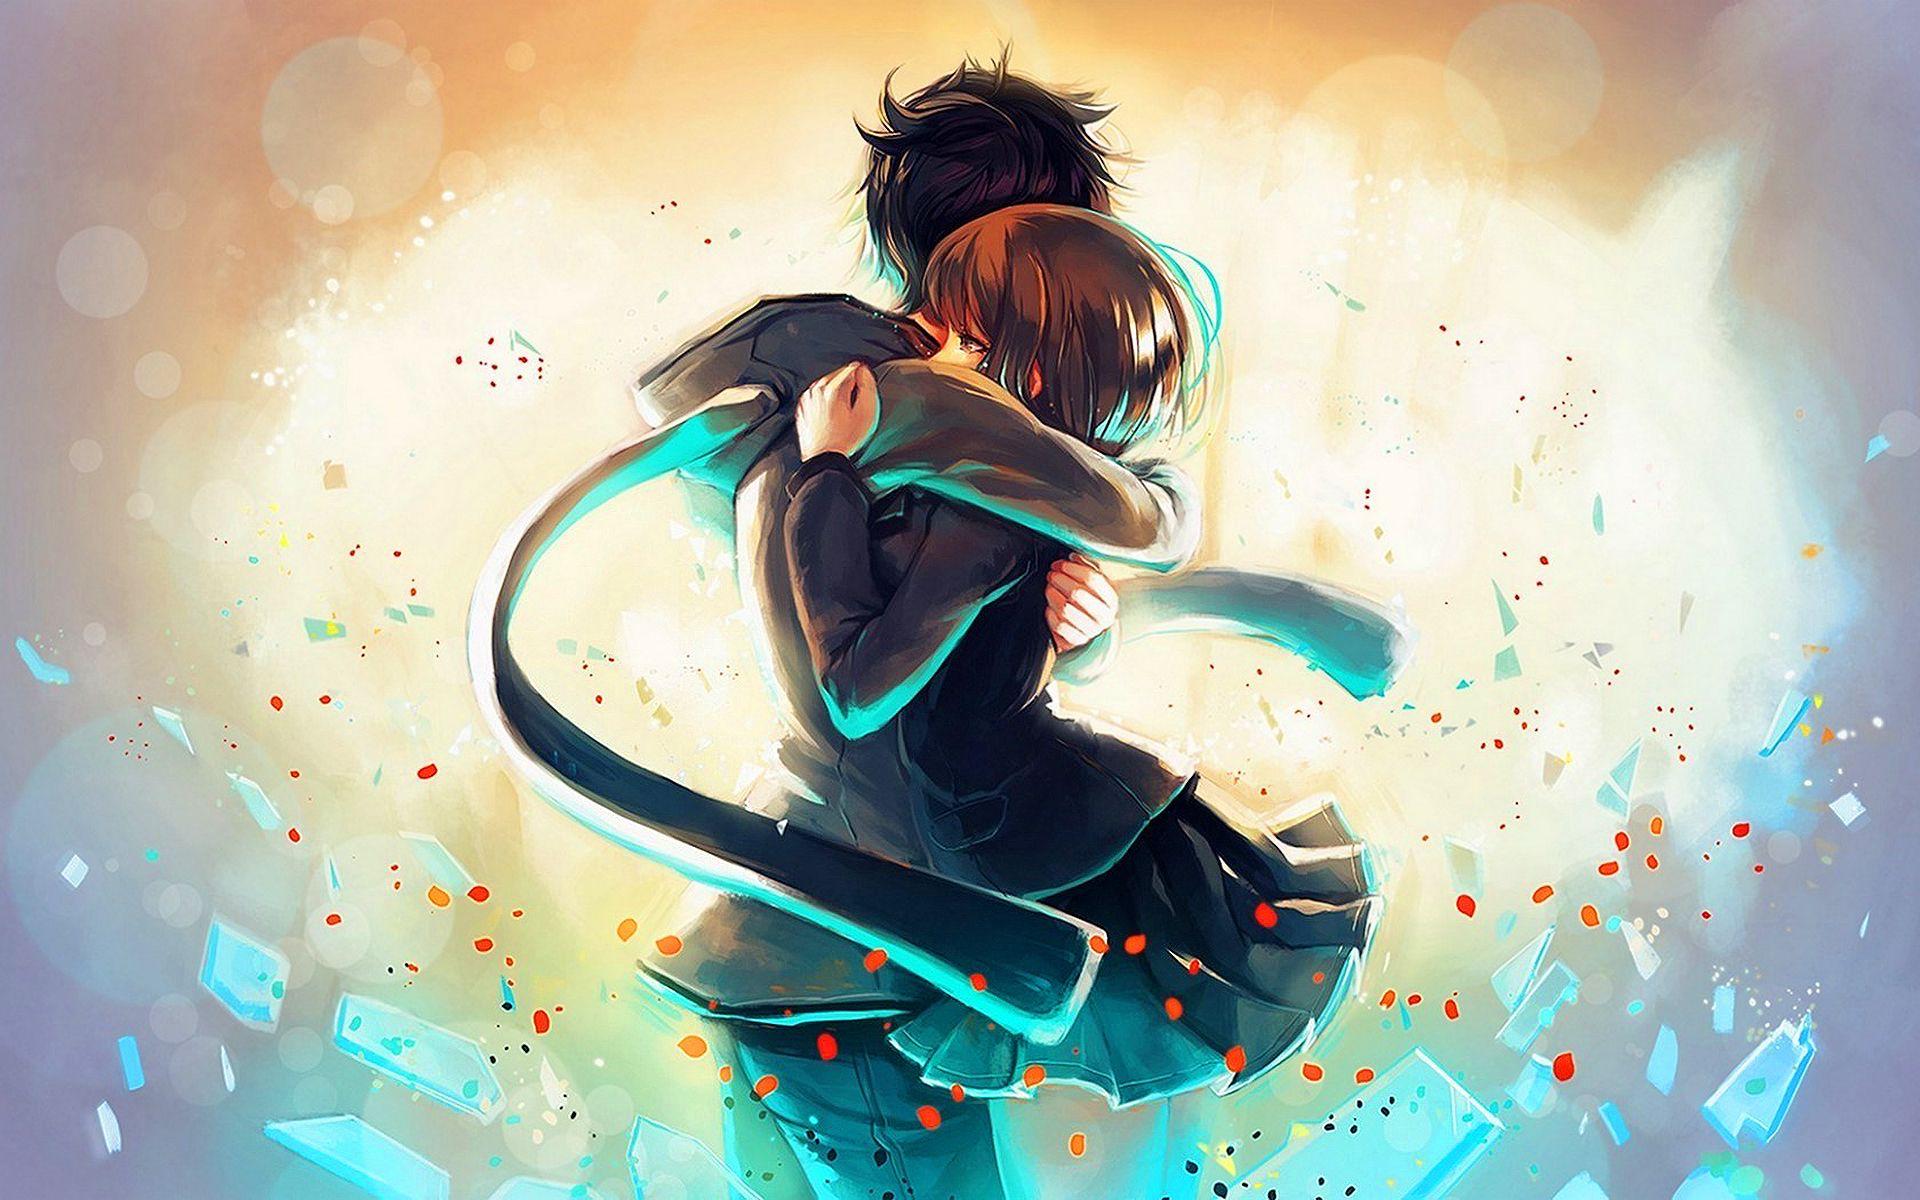 27+] Anime Boy And Girl Wallpapers on ...